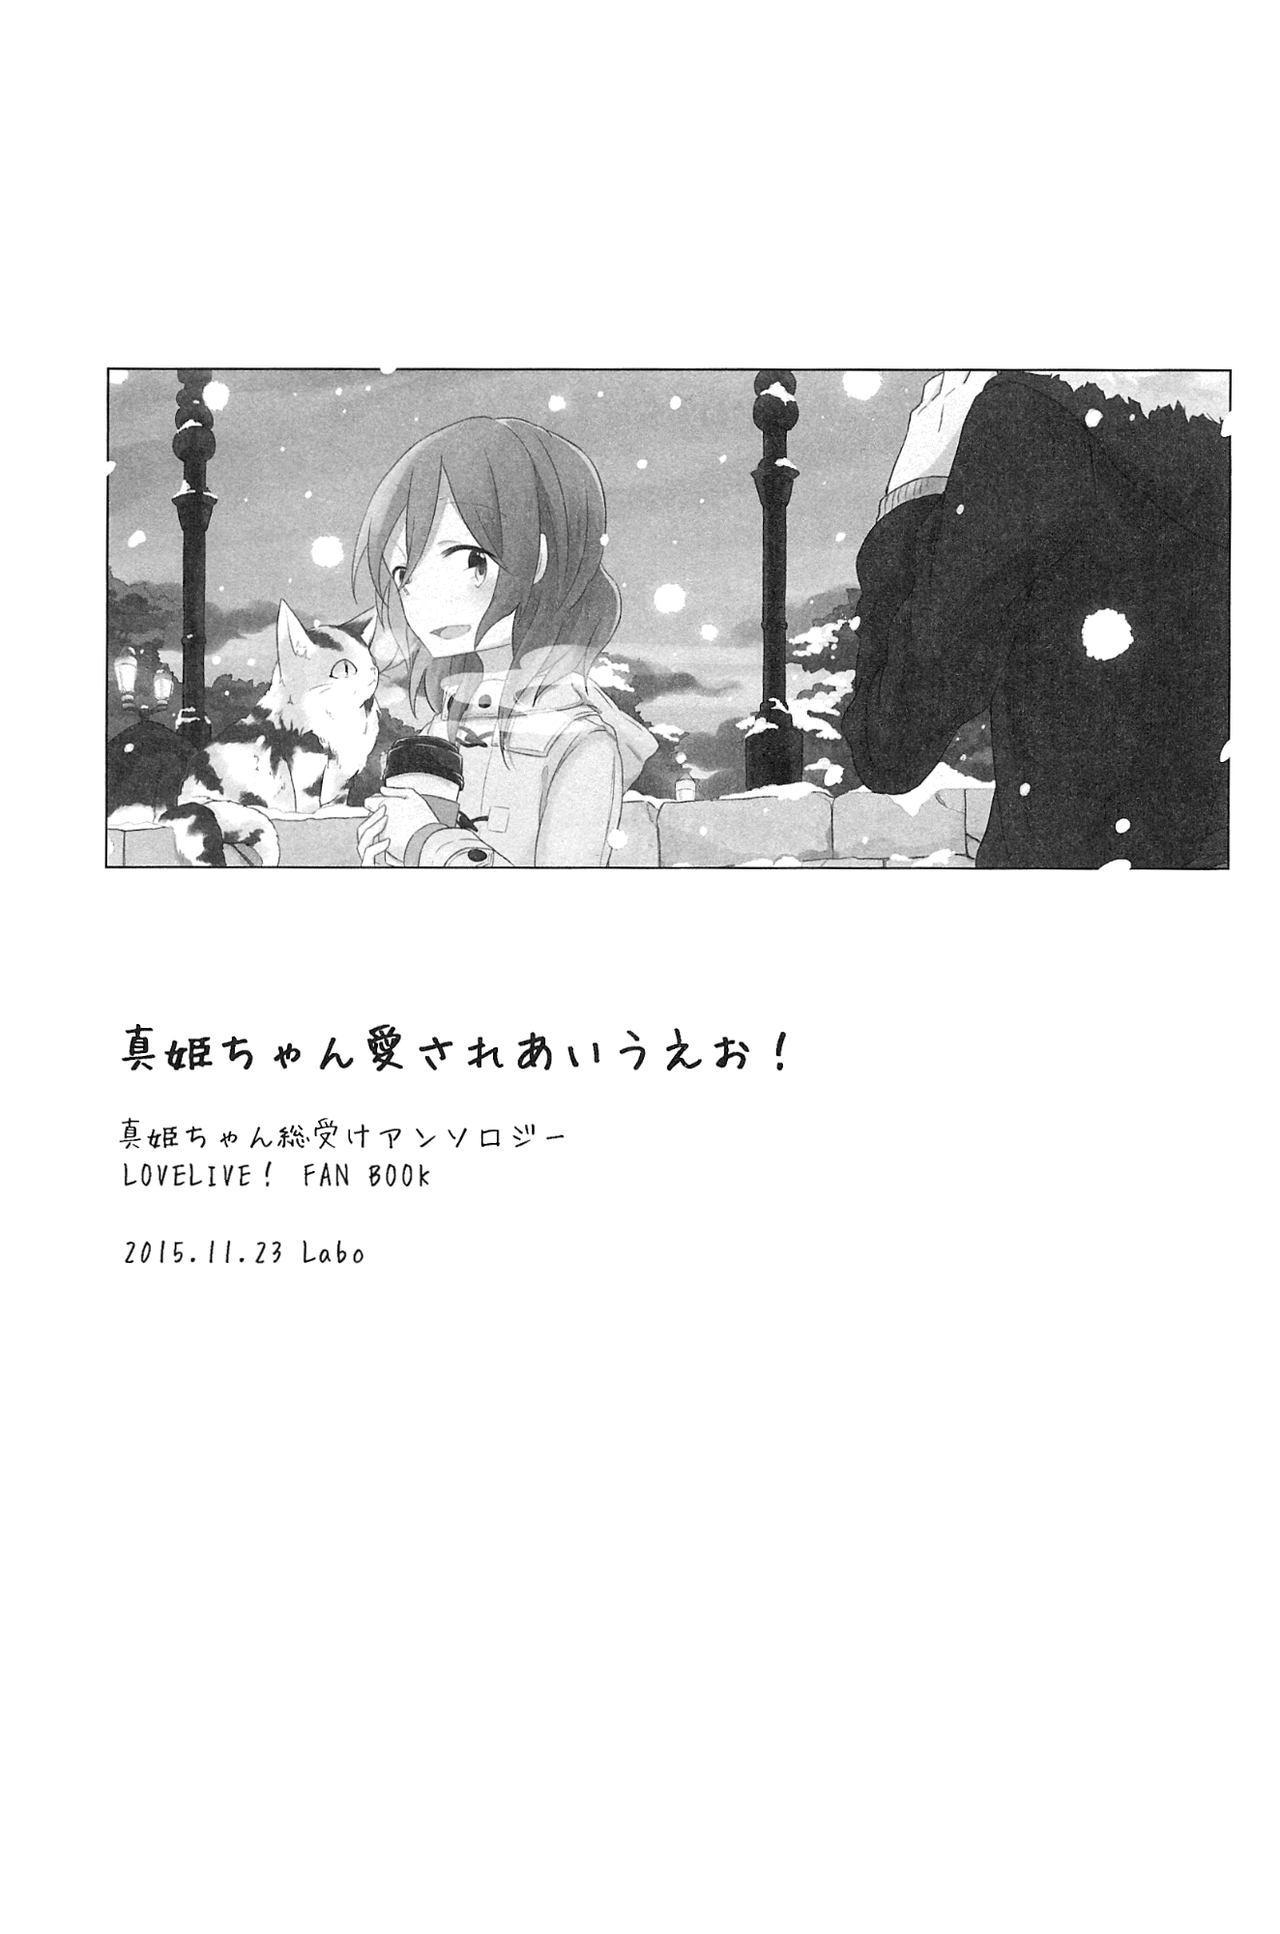 (Bokura no Love Live! 10) [Labo (Various)] Maki-chan Aisare aiueo!   Maki-chan Loved Alphabetically! (Love Live!) [English] {/u/ scanlations} [Incomplete] 2